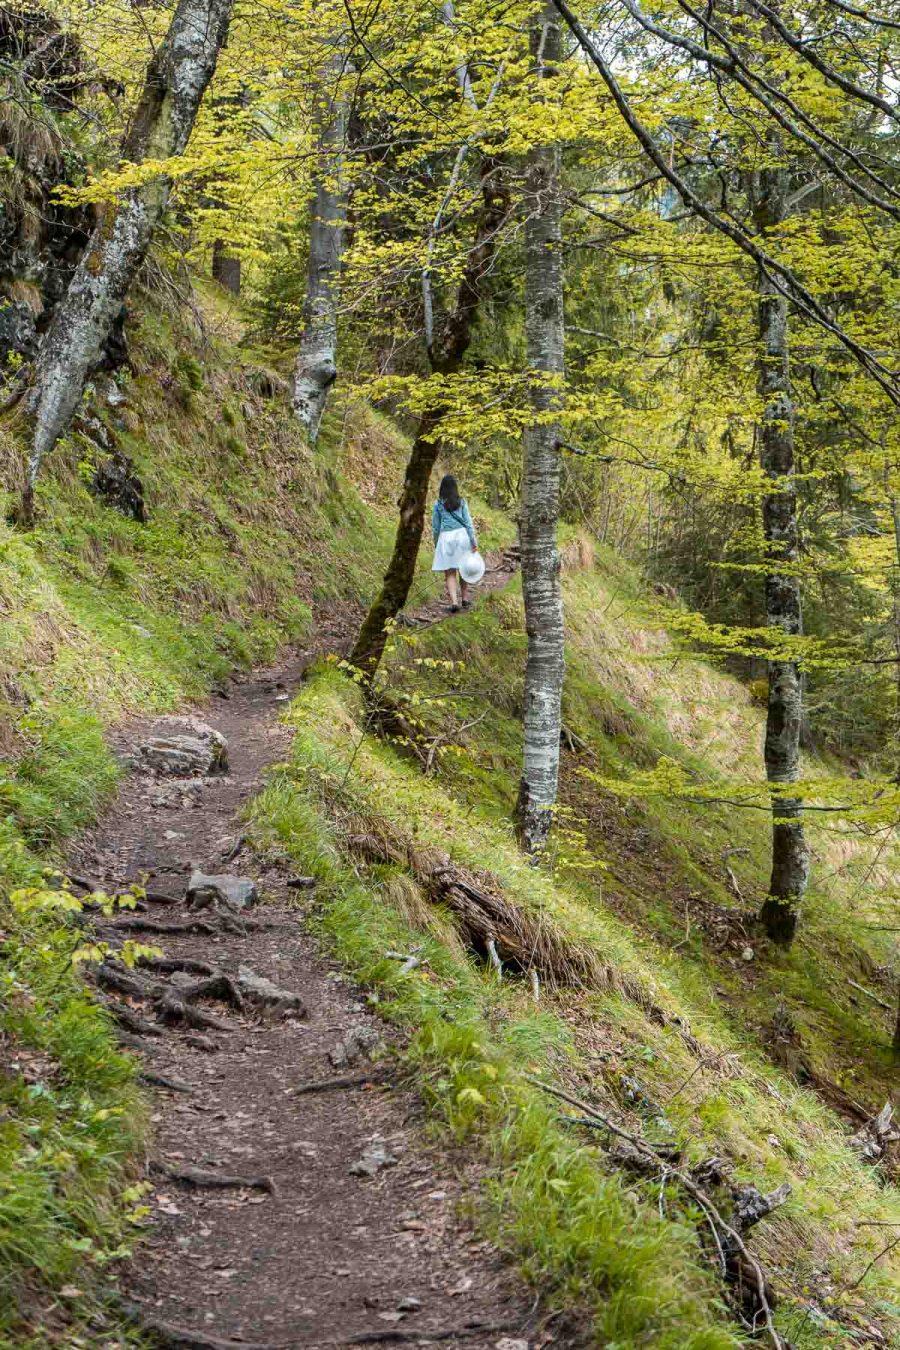 Roads leading to the Neuschwanstein Castle